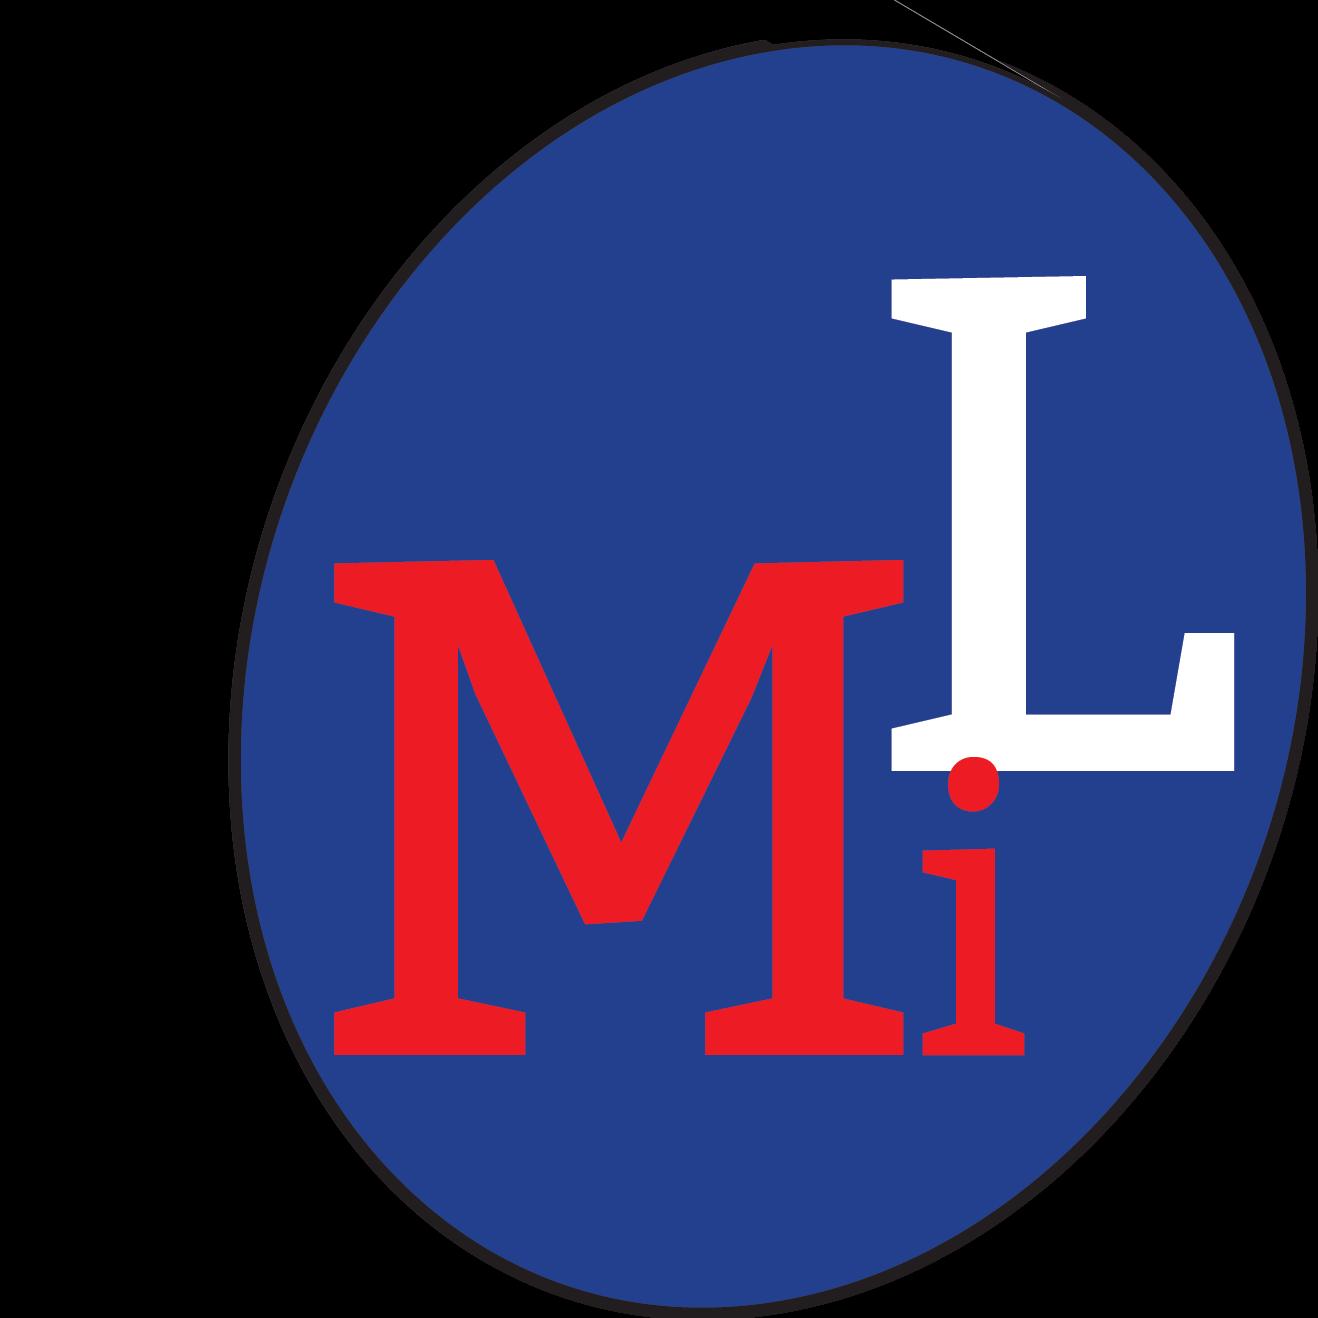 Milano lavoro milanolavoronew twitter for Lavoro a milano